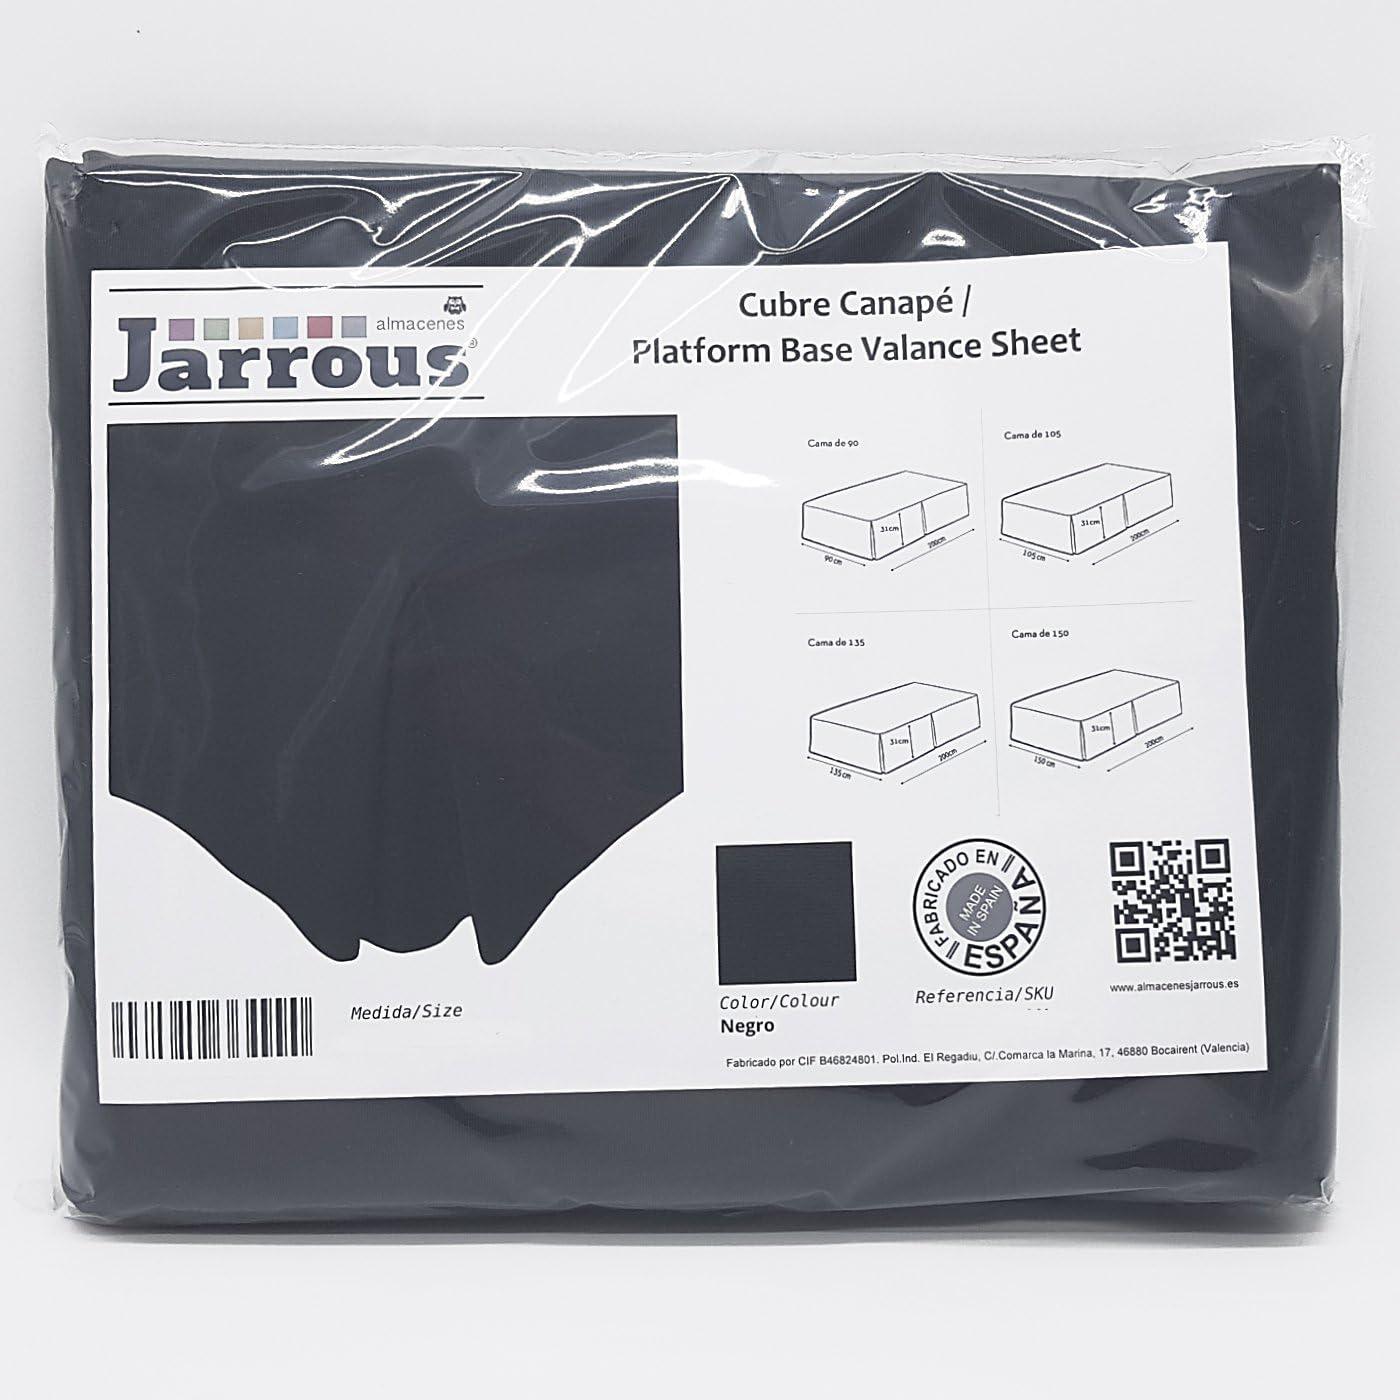 Jarrous Cubre Canapé Modelo Pierre, Color Negro, Medida para Cama de 105